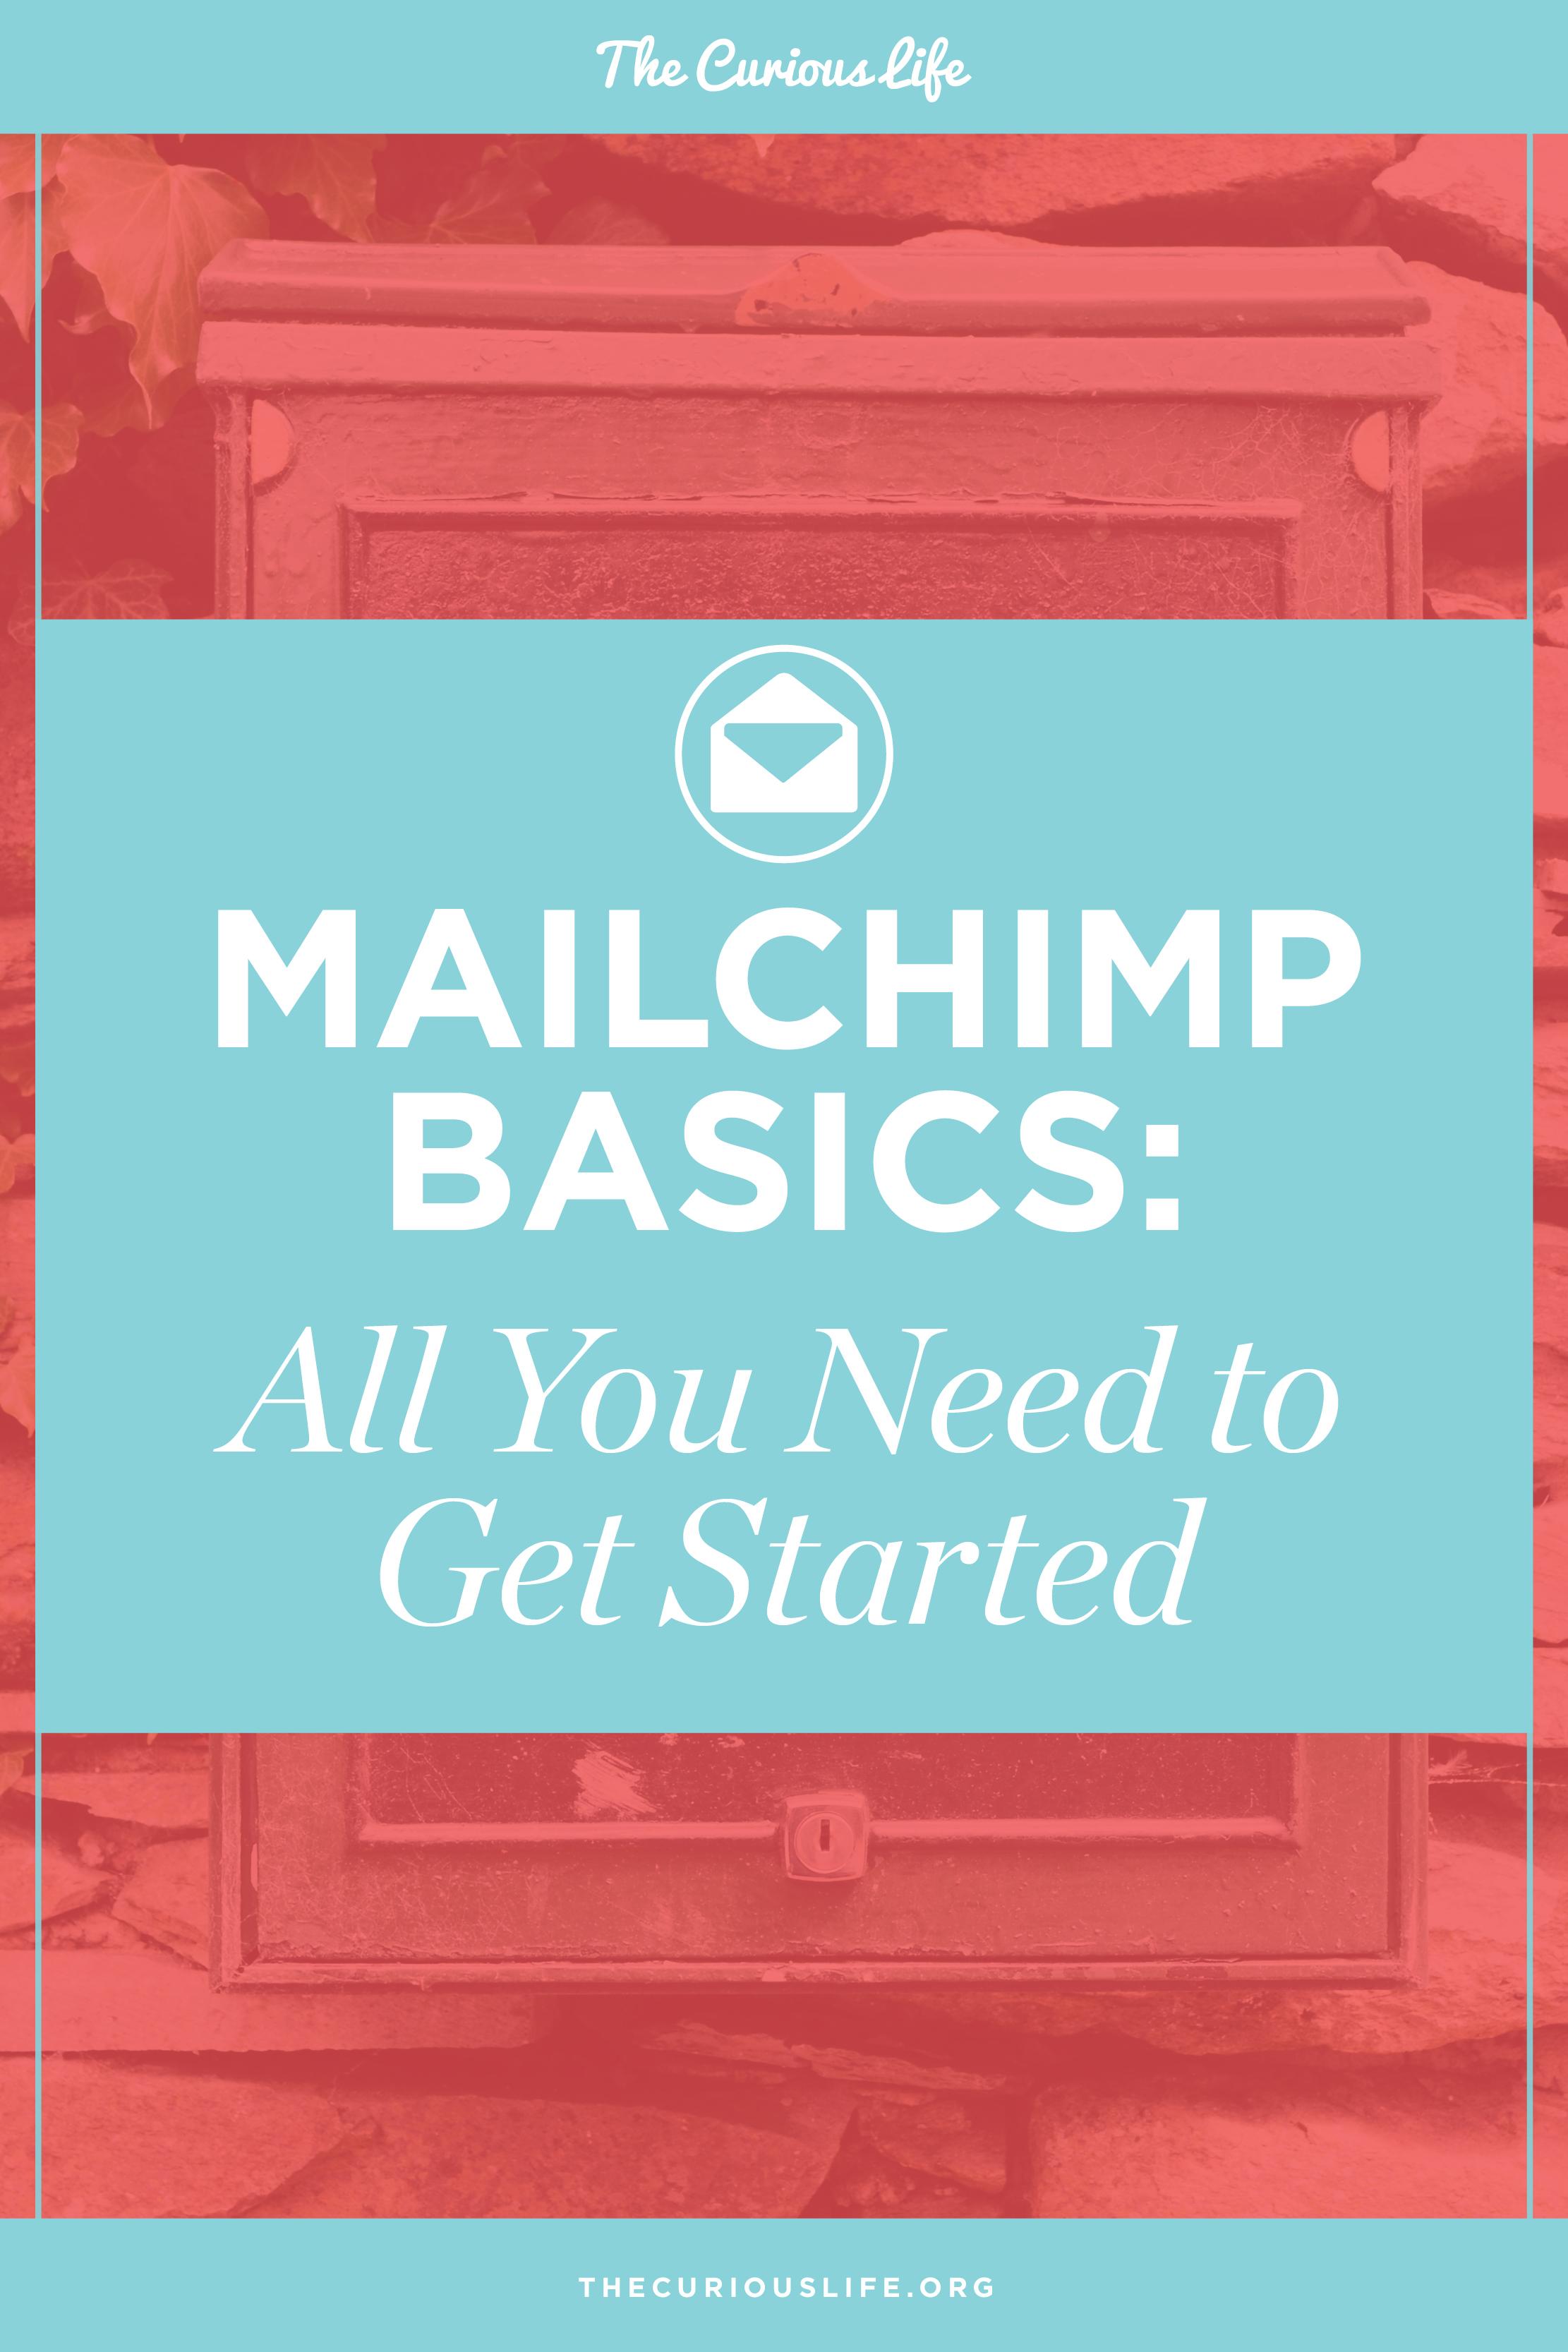 mailchimp basics how-to newsletter list tutorial